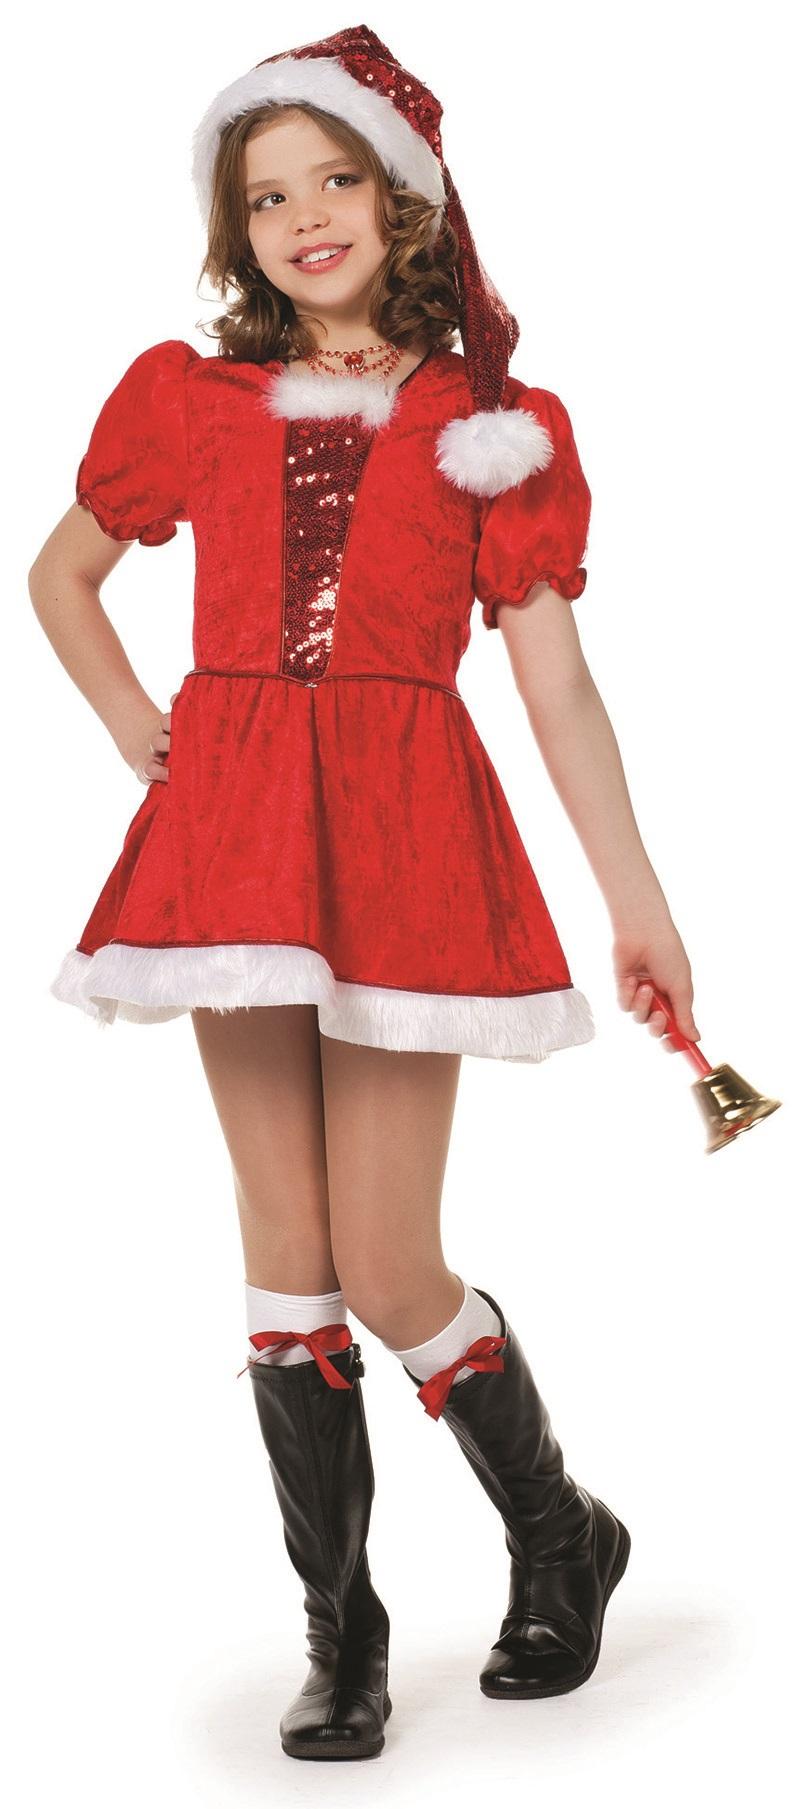 Kerstjurk met pailletten voor meisje